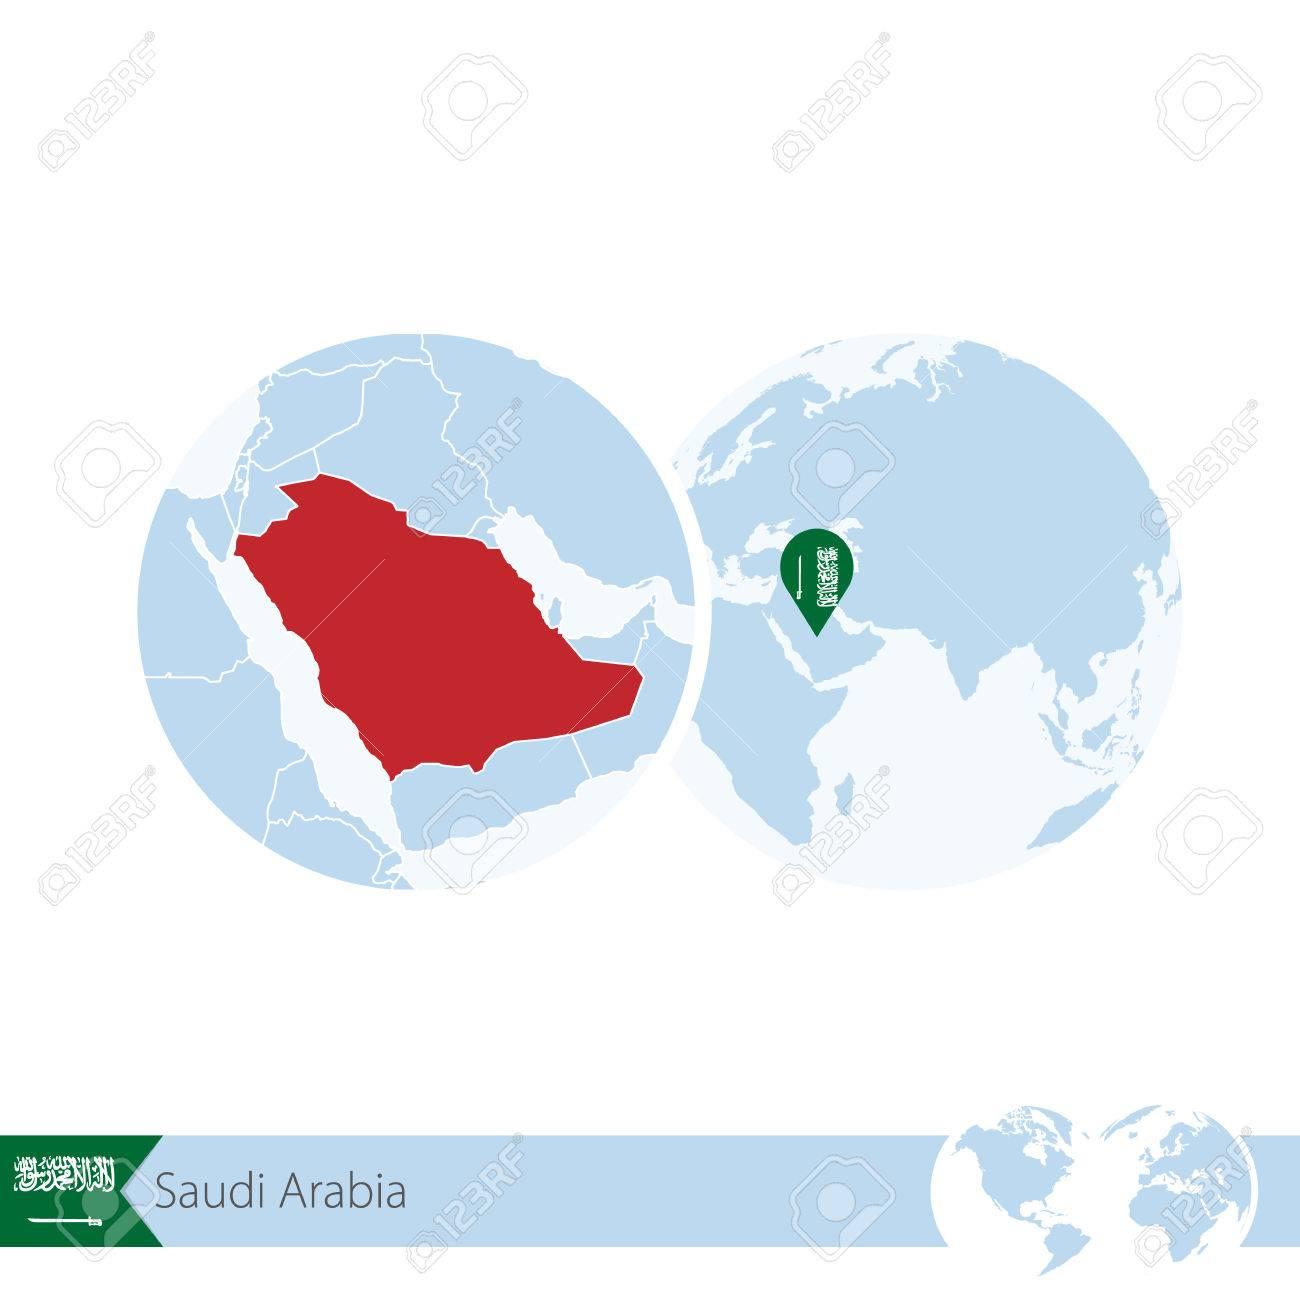 Saudi Arabia On World Globe With Flag And Regional Map Of Saudi ...